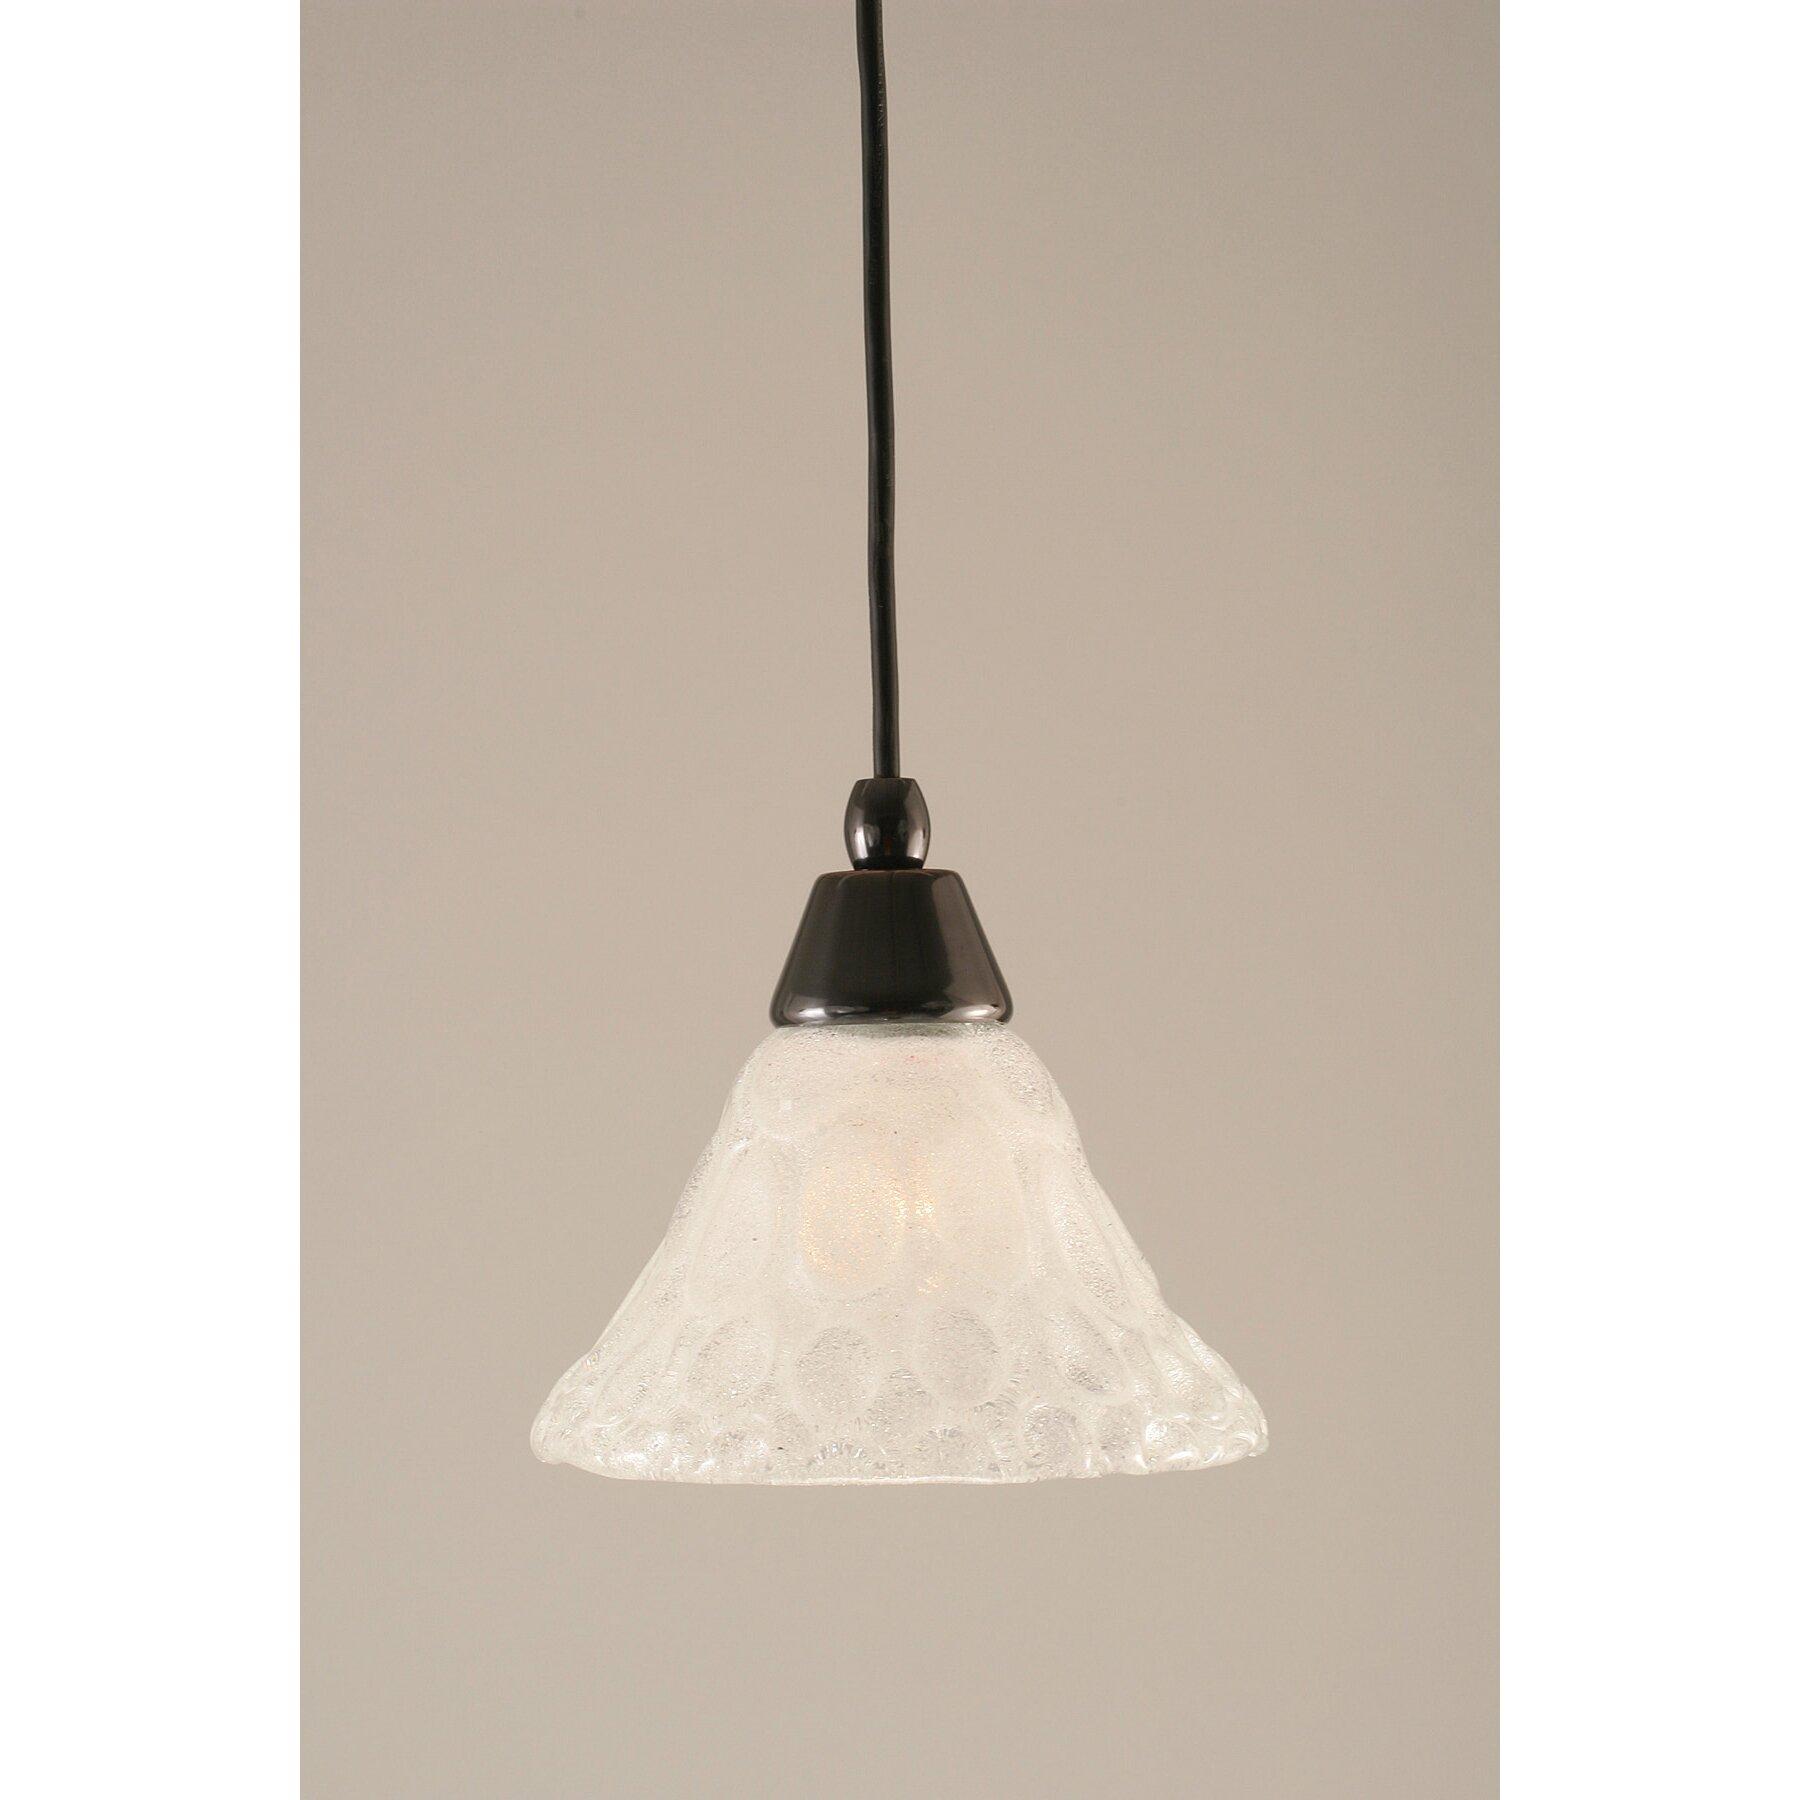 Light Pendant Cord